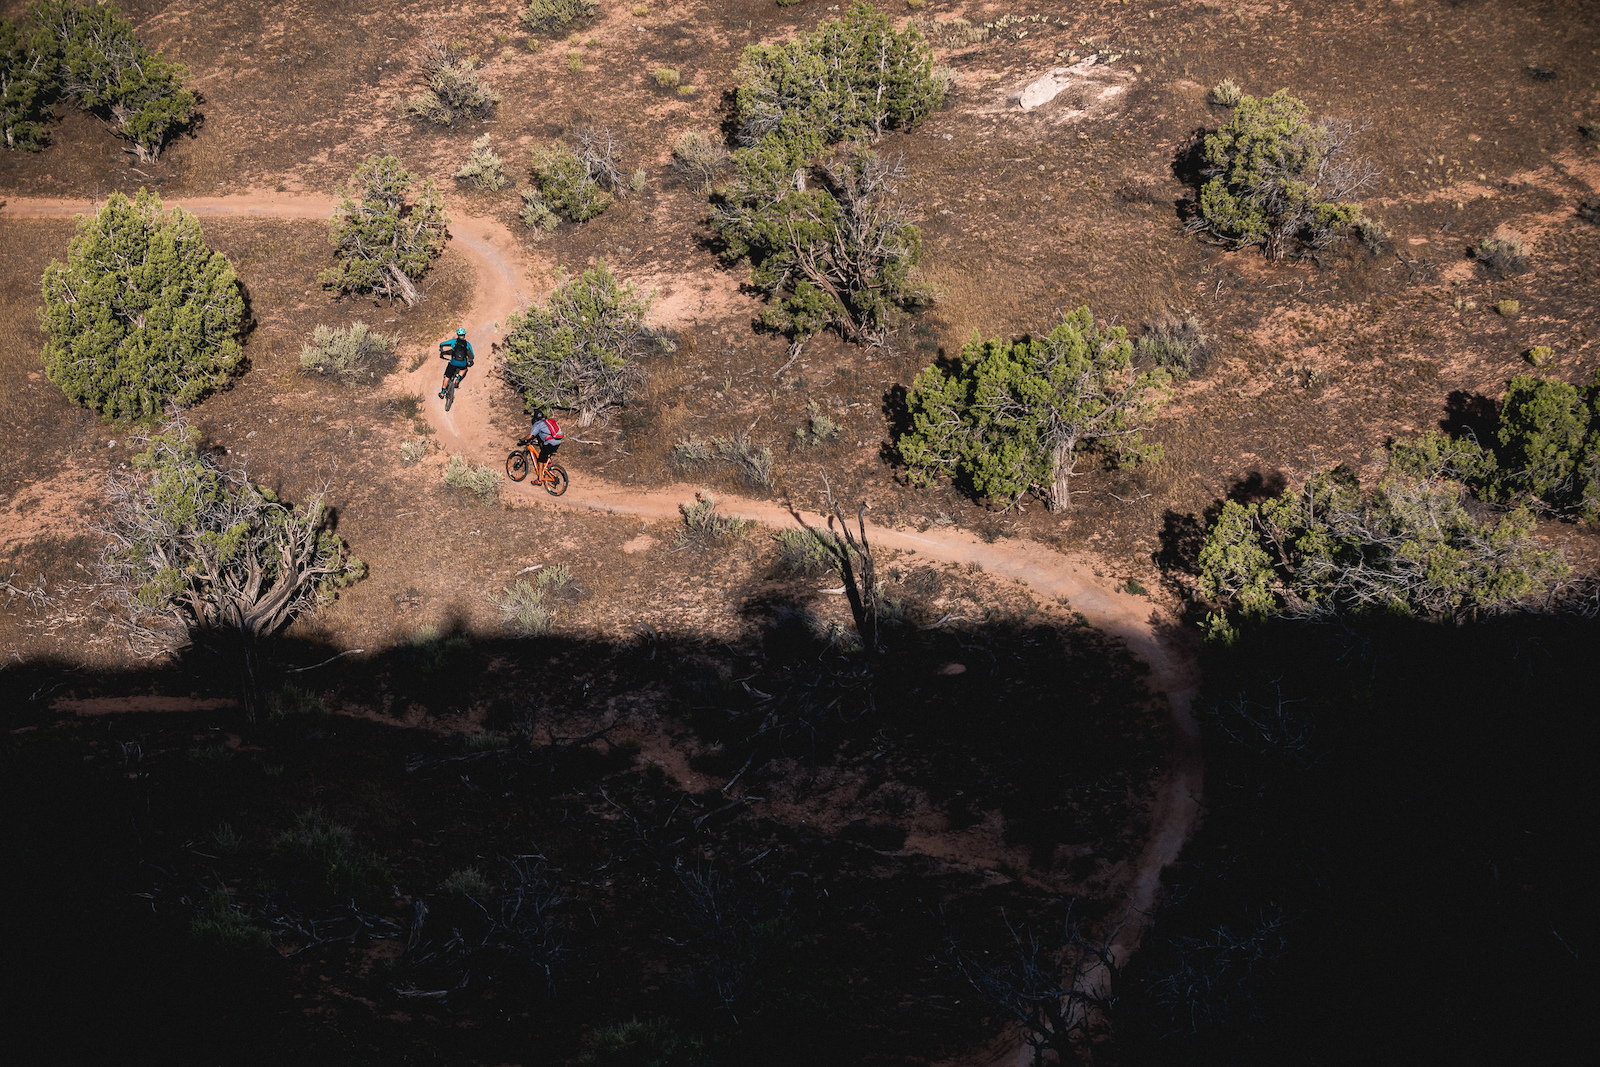 A Journey Through Colorado s Trail Diversity - Alpine meadows to red desert